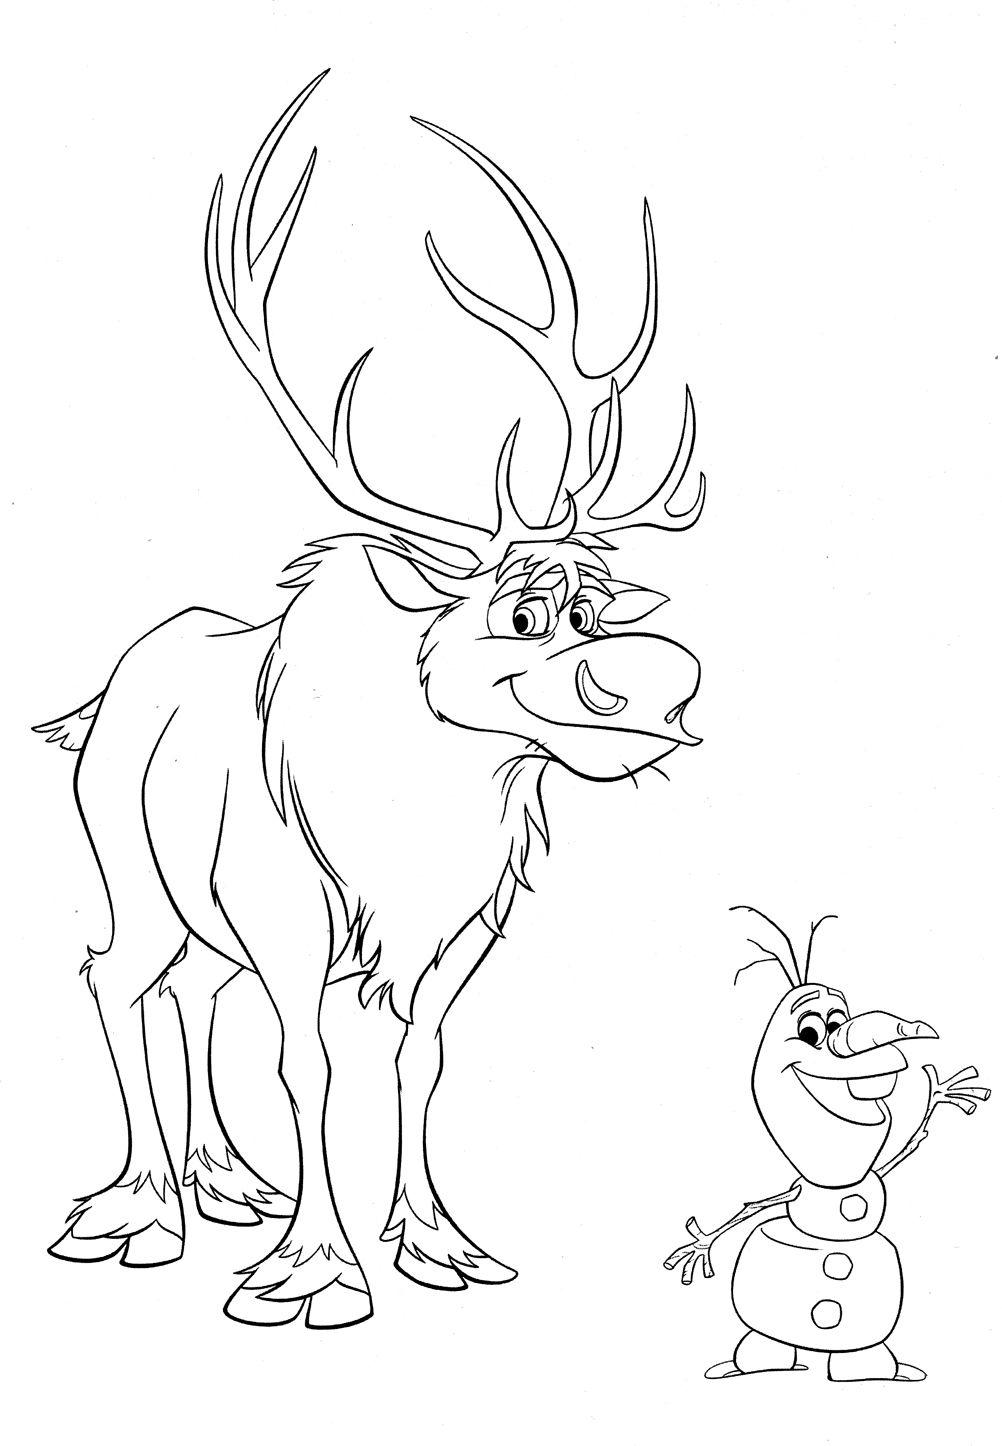 Coloriages la reine des neiges  imprimer Sven et Olaf